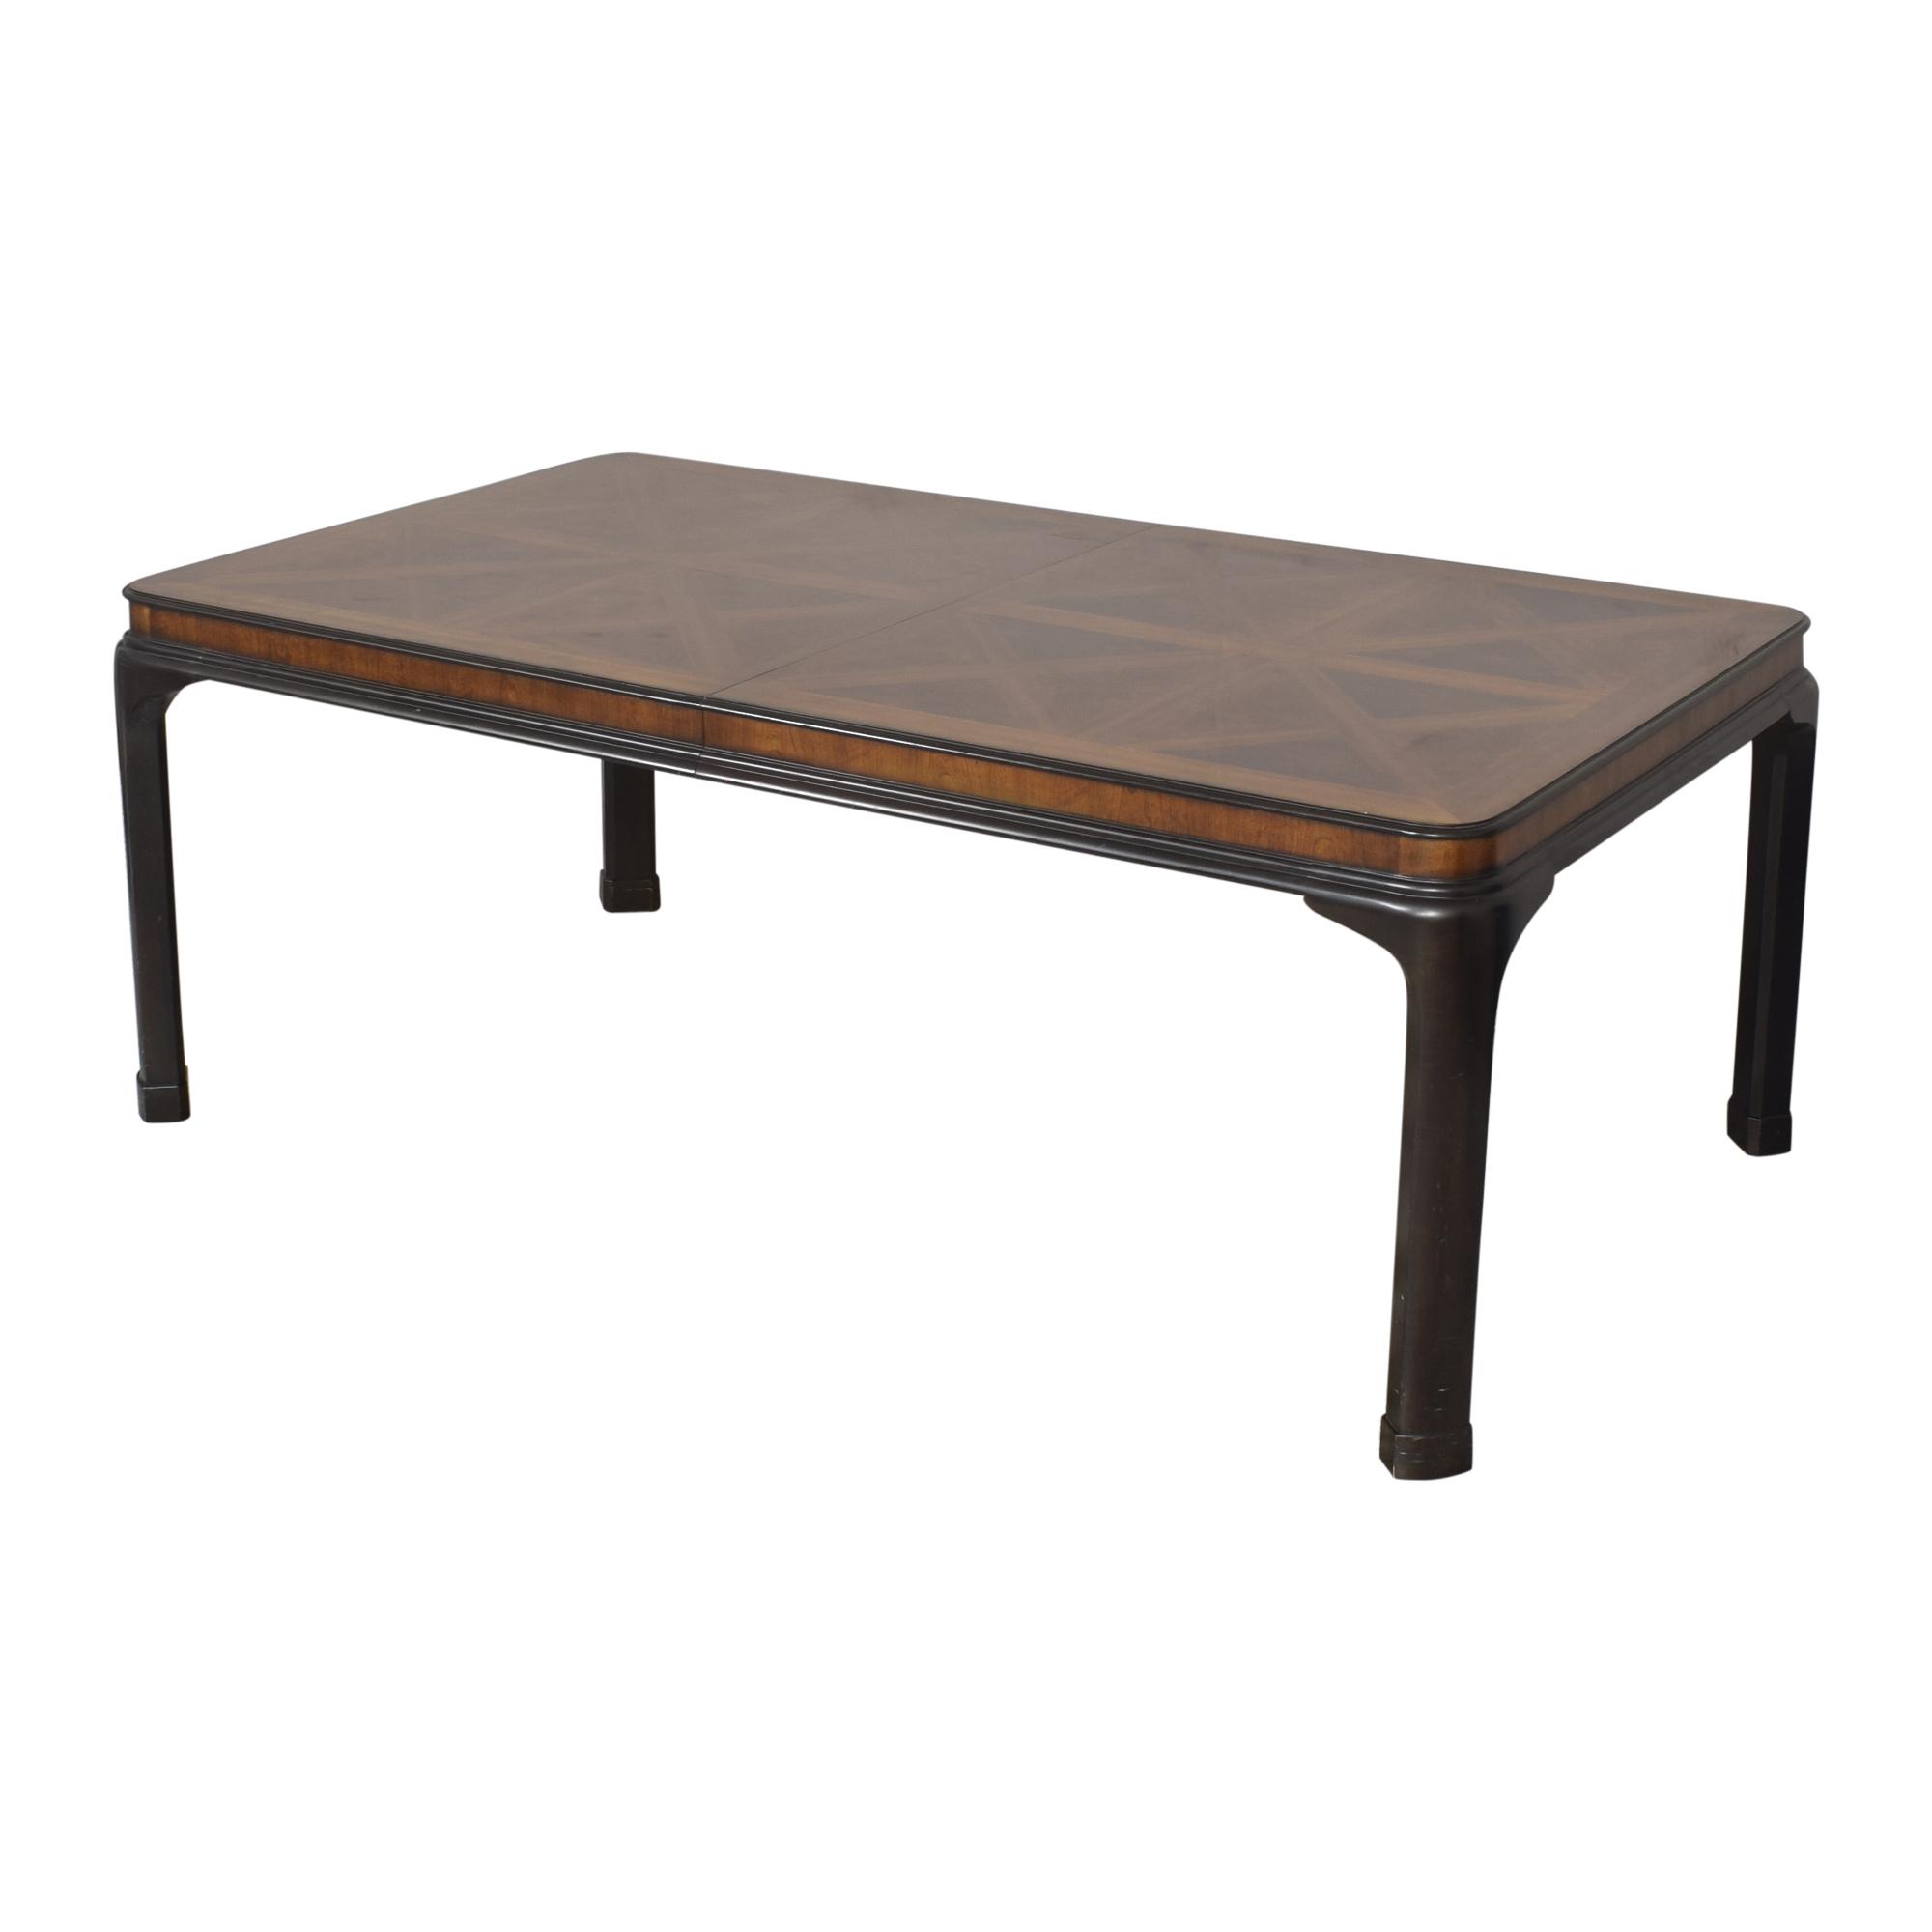 Drexel Heritage Drexel Heritage Connoisseur Dining Table for sale